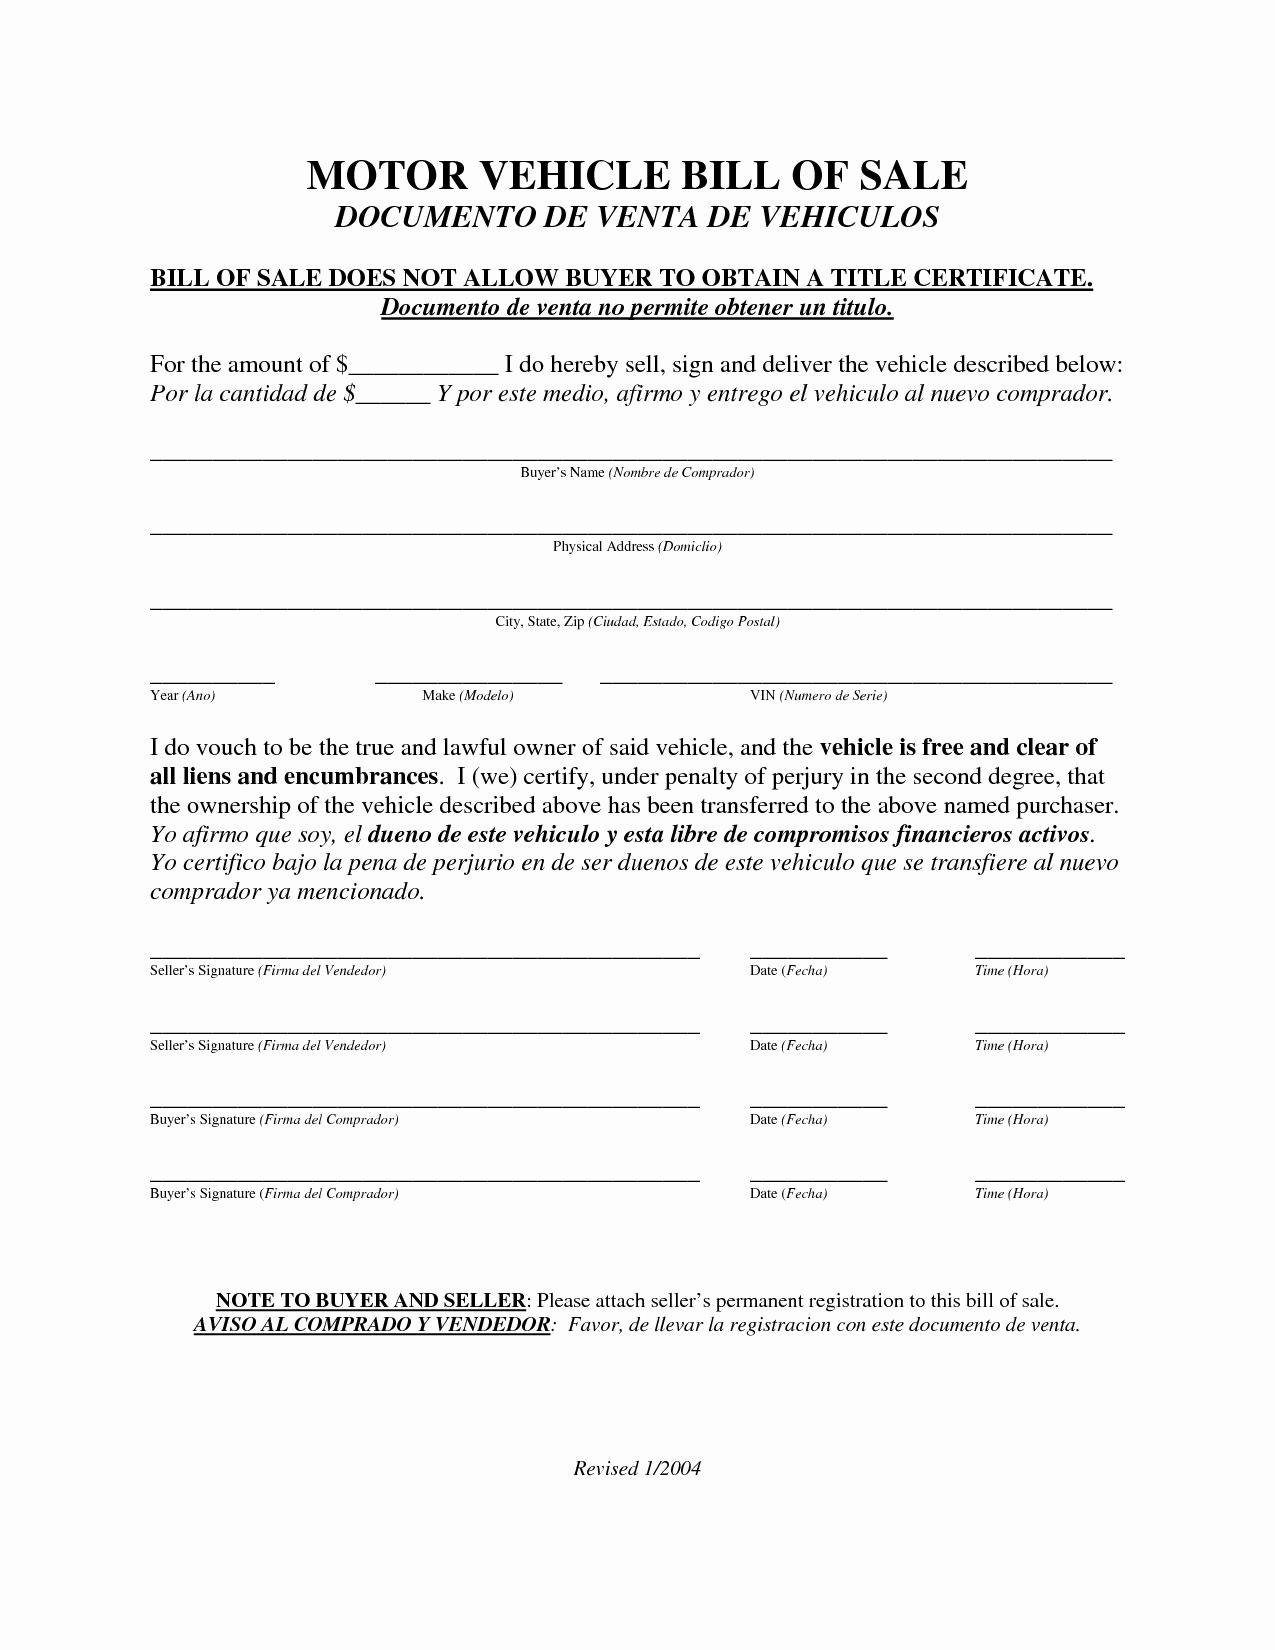 Auto Bill Of Sale Texas Lovely Texas Motor Vehicle Registration Fees Impremedia